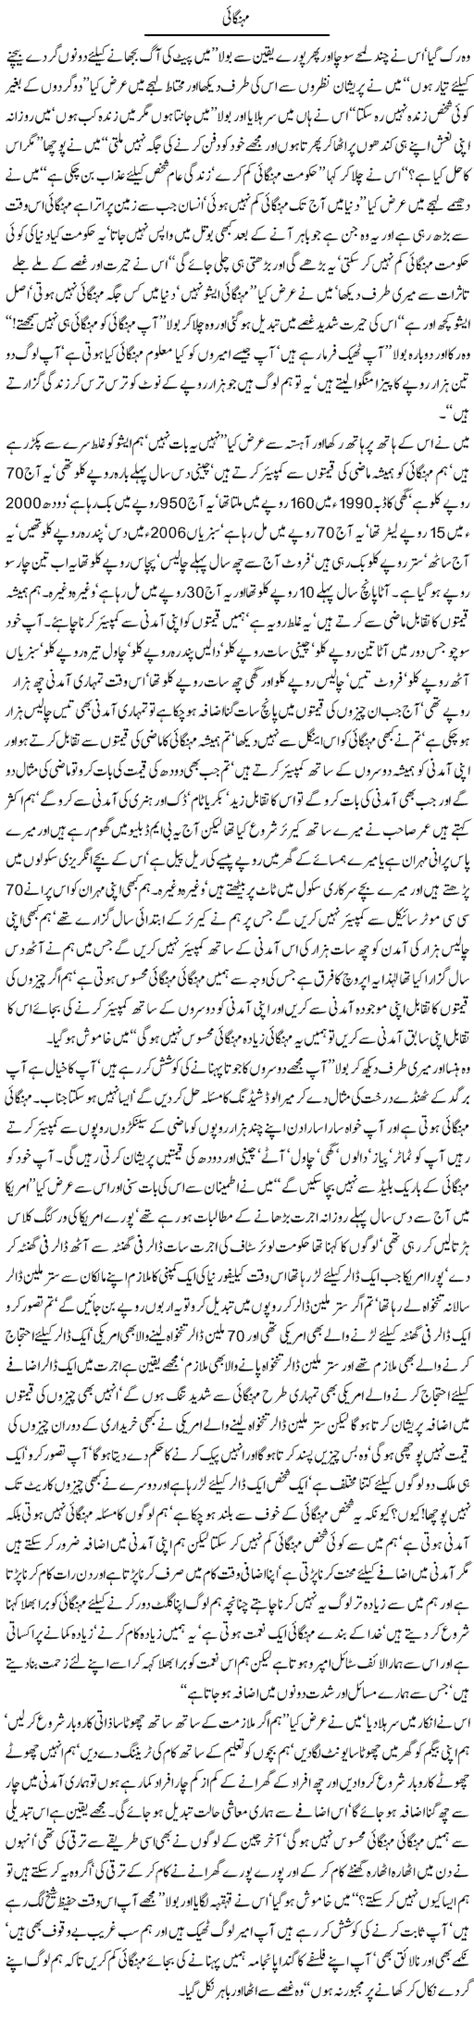 mukalma in urdu on mehangai essay